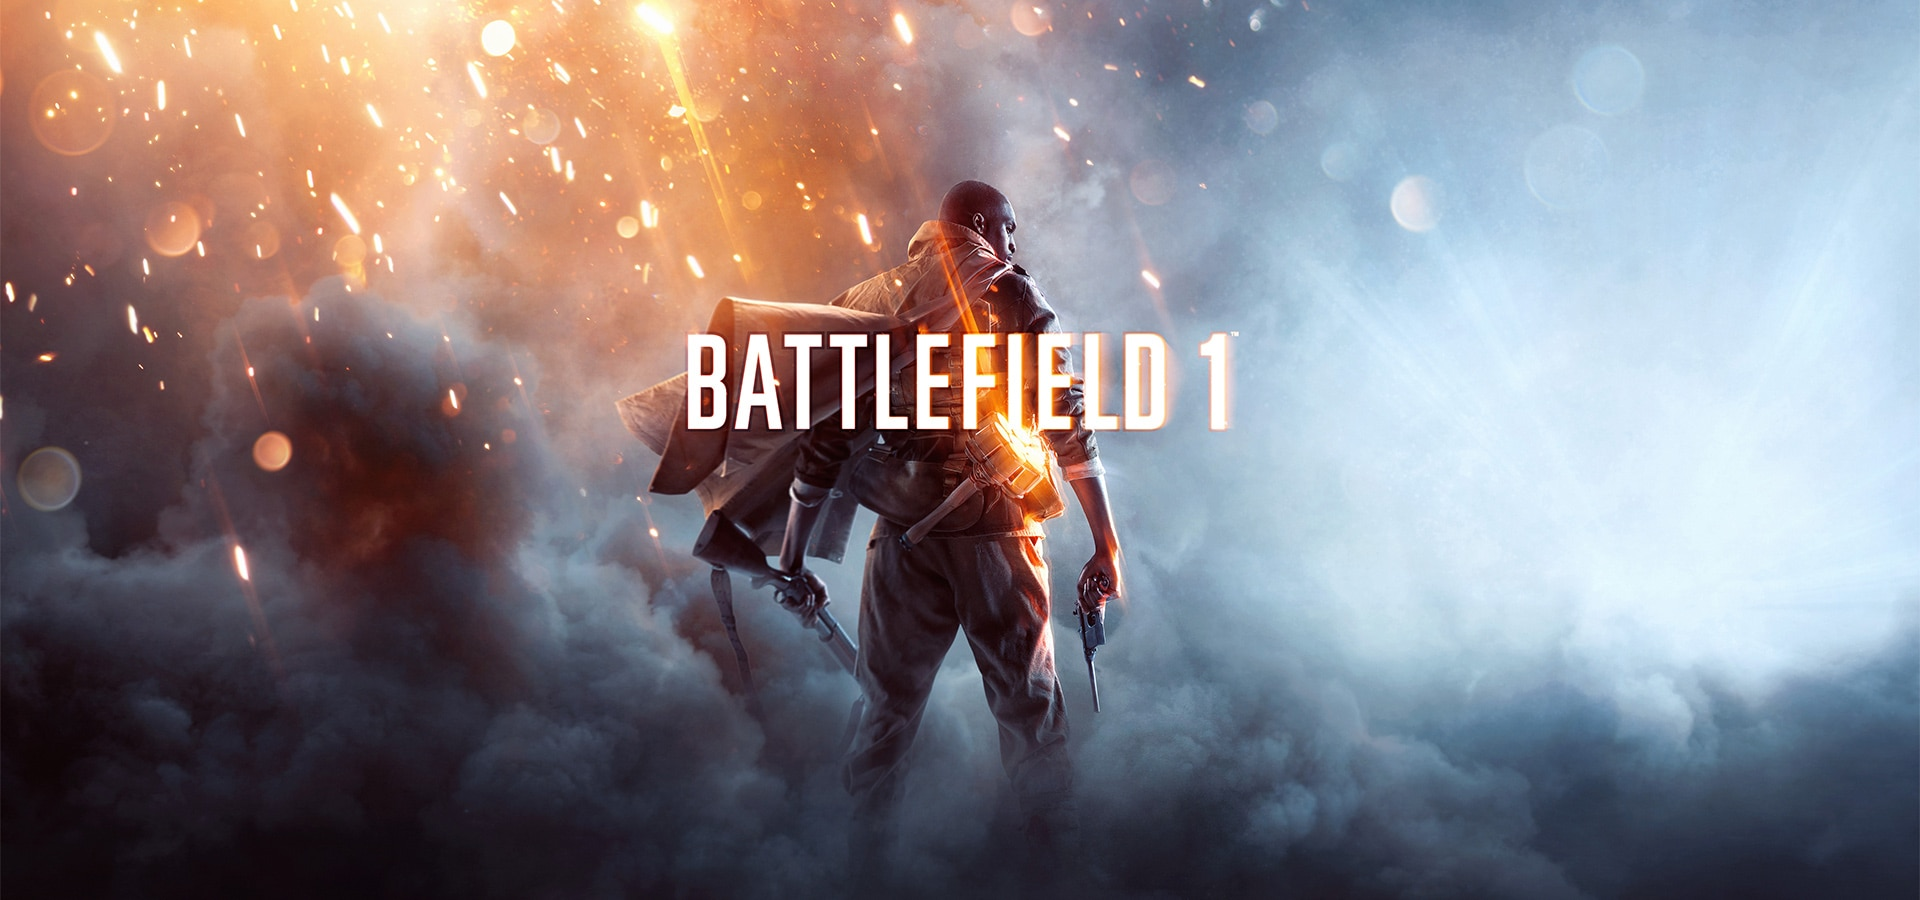 Hd Gamer Wallpaper Battlefield 1 Amd